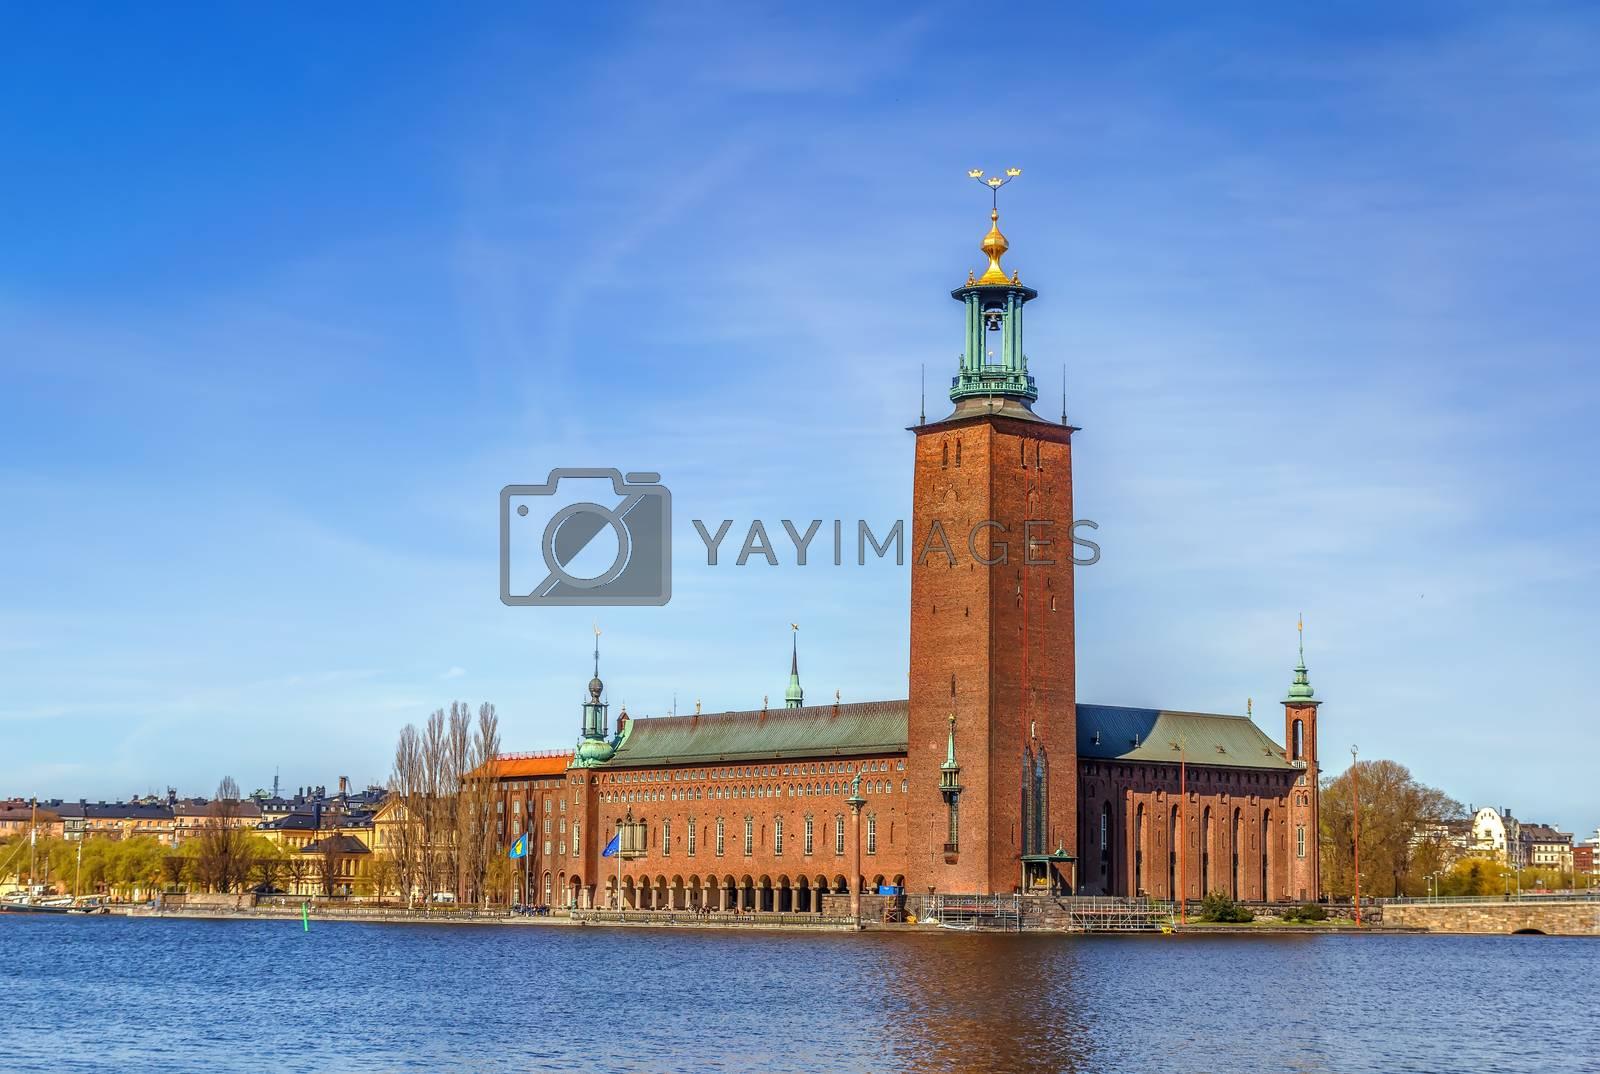 Stockholm City Hall by borisb17